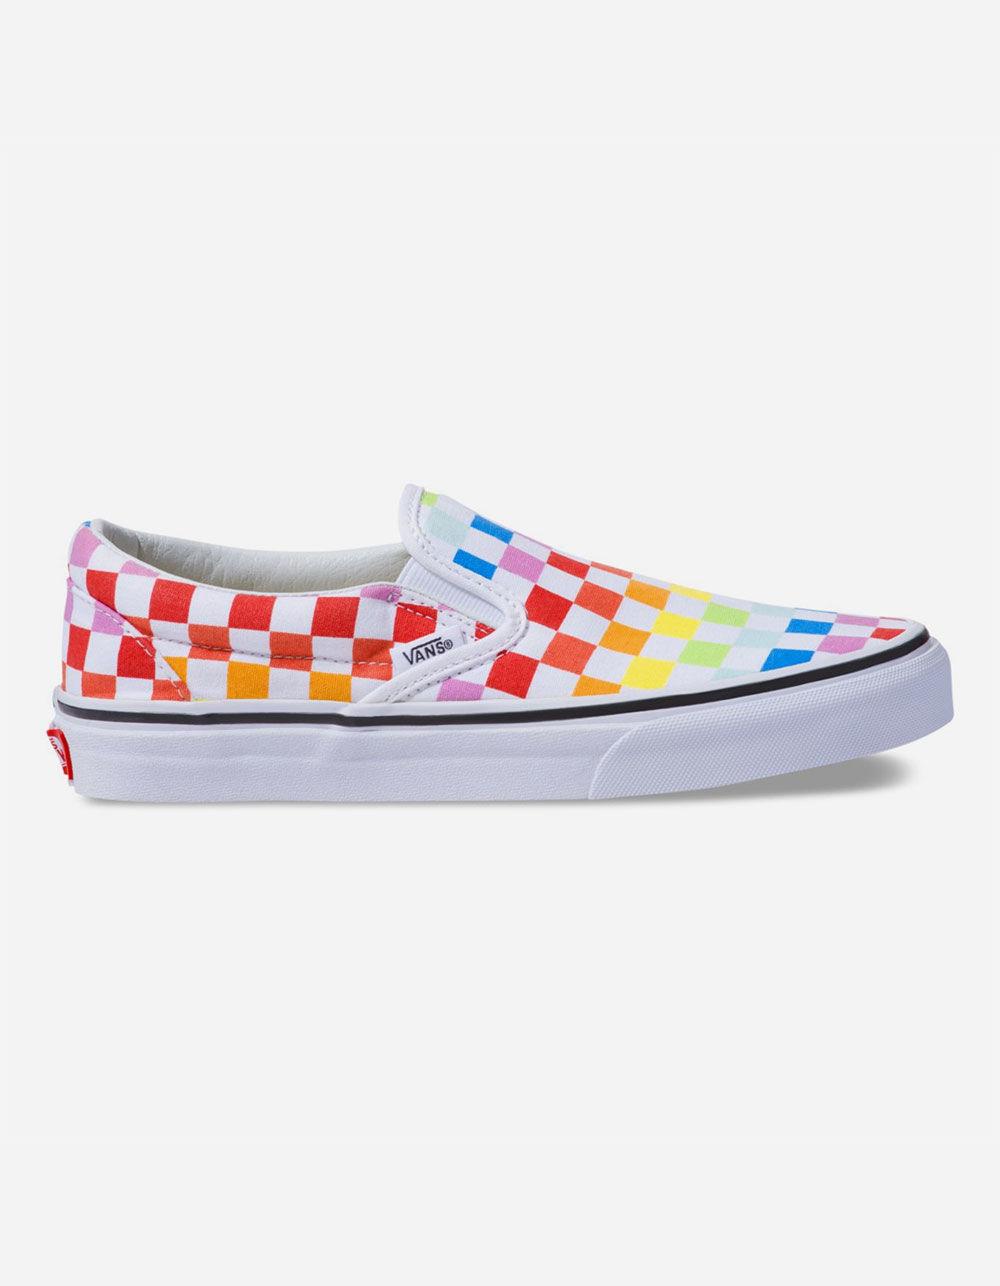 VANS Checkerboard Slip-On Rainbow Shoes